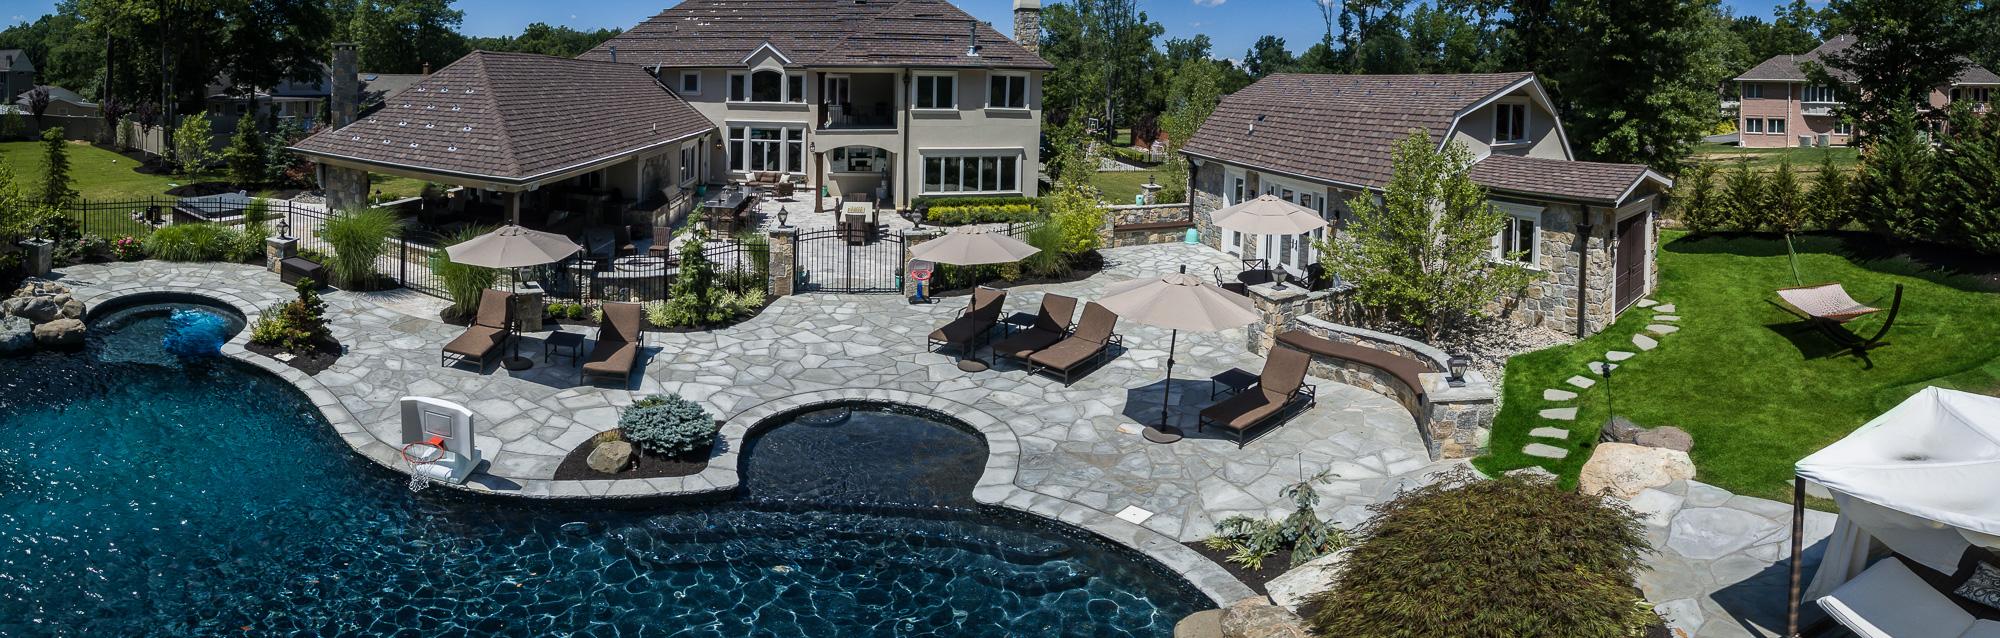 livingston nj custom inground swimming pool design u0026 construction